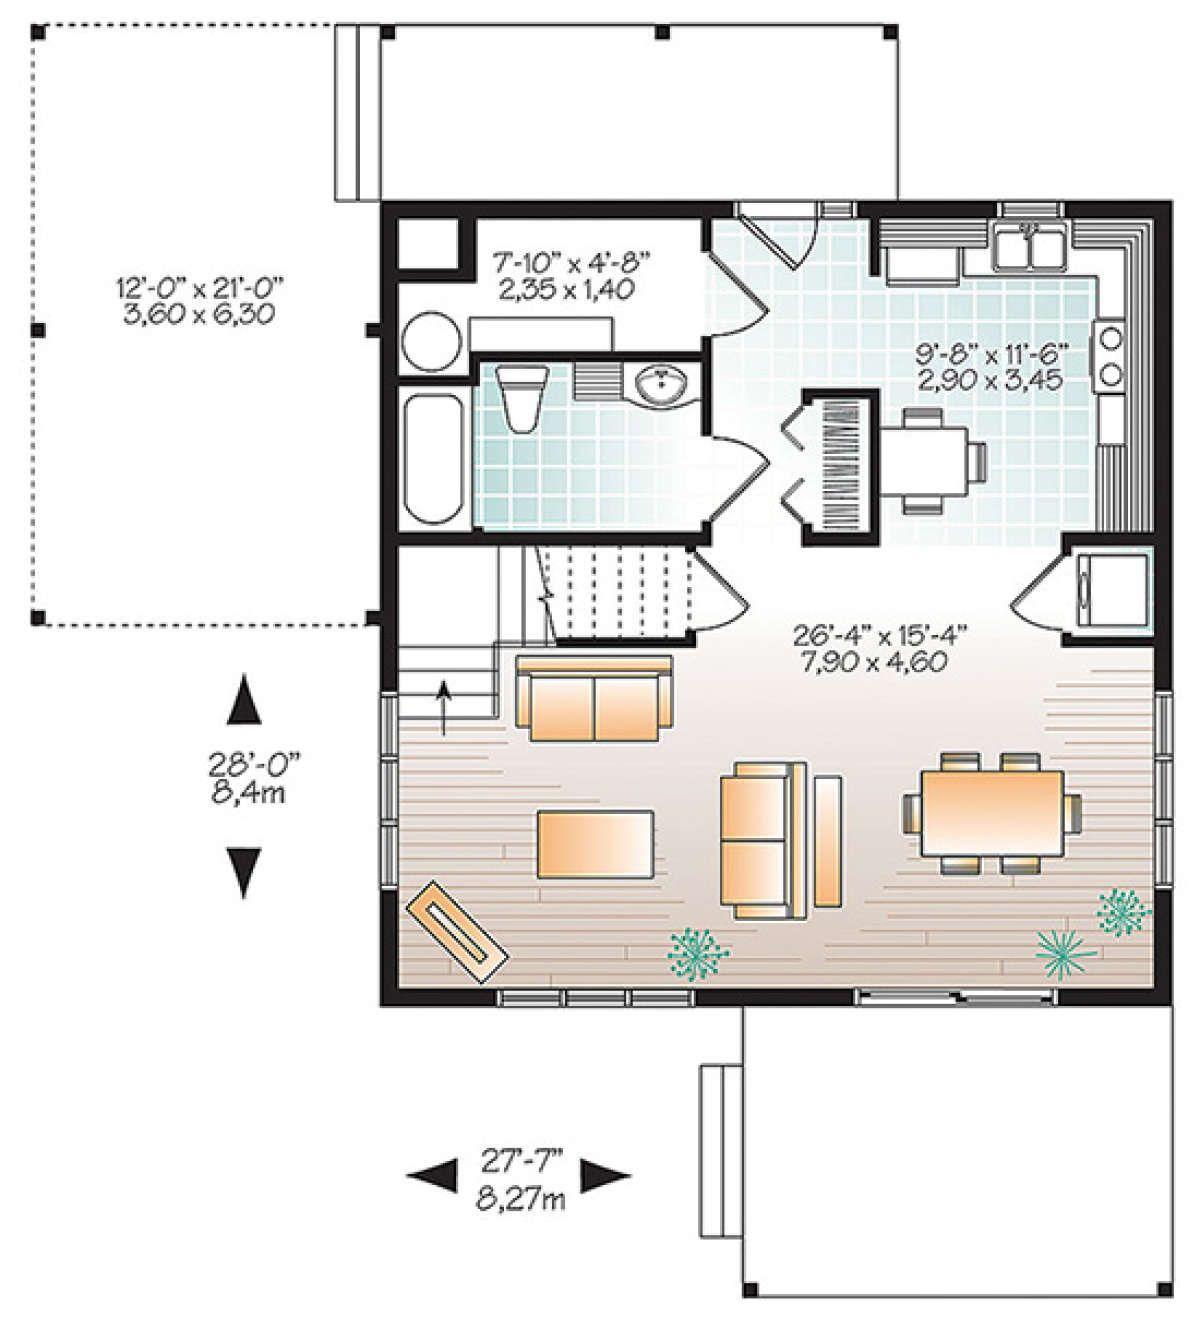 House Plan 034 01116 Contemporary Plan 1 200 Square Feet 2 Bedrooms 2 Bathrooms In 2021 Modern Contemporary House Plans Modern Style House Plans House Plans